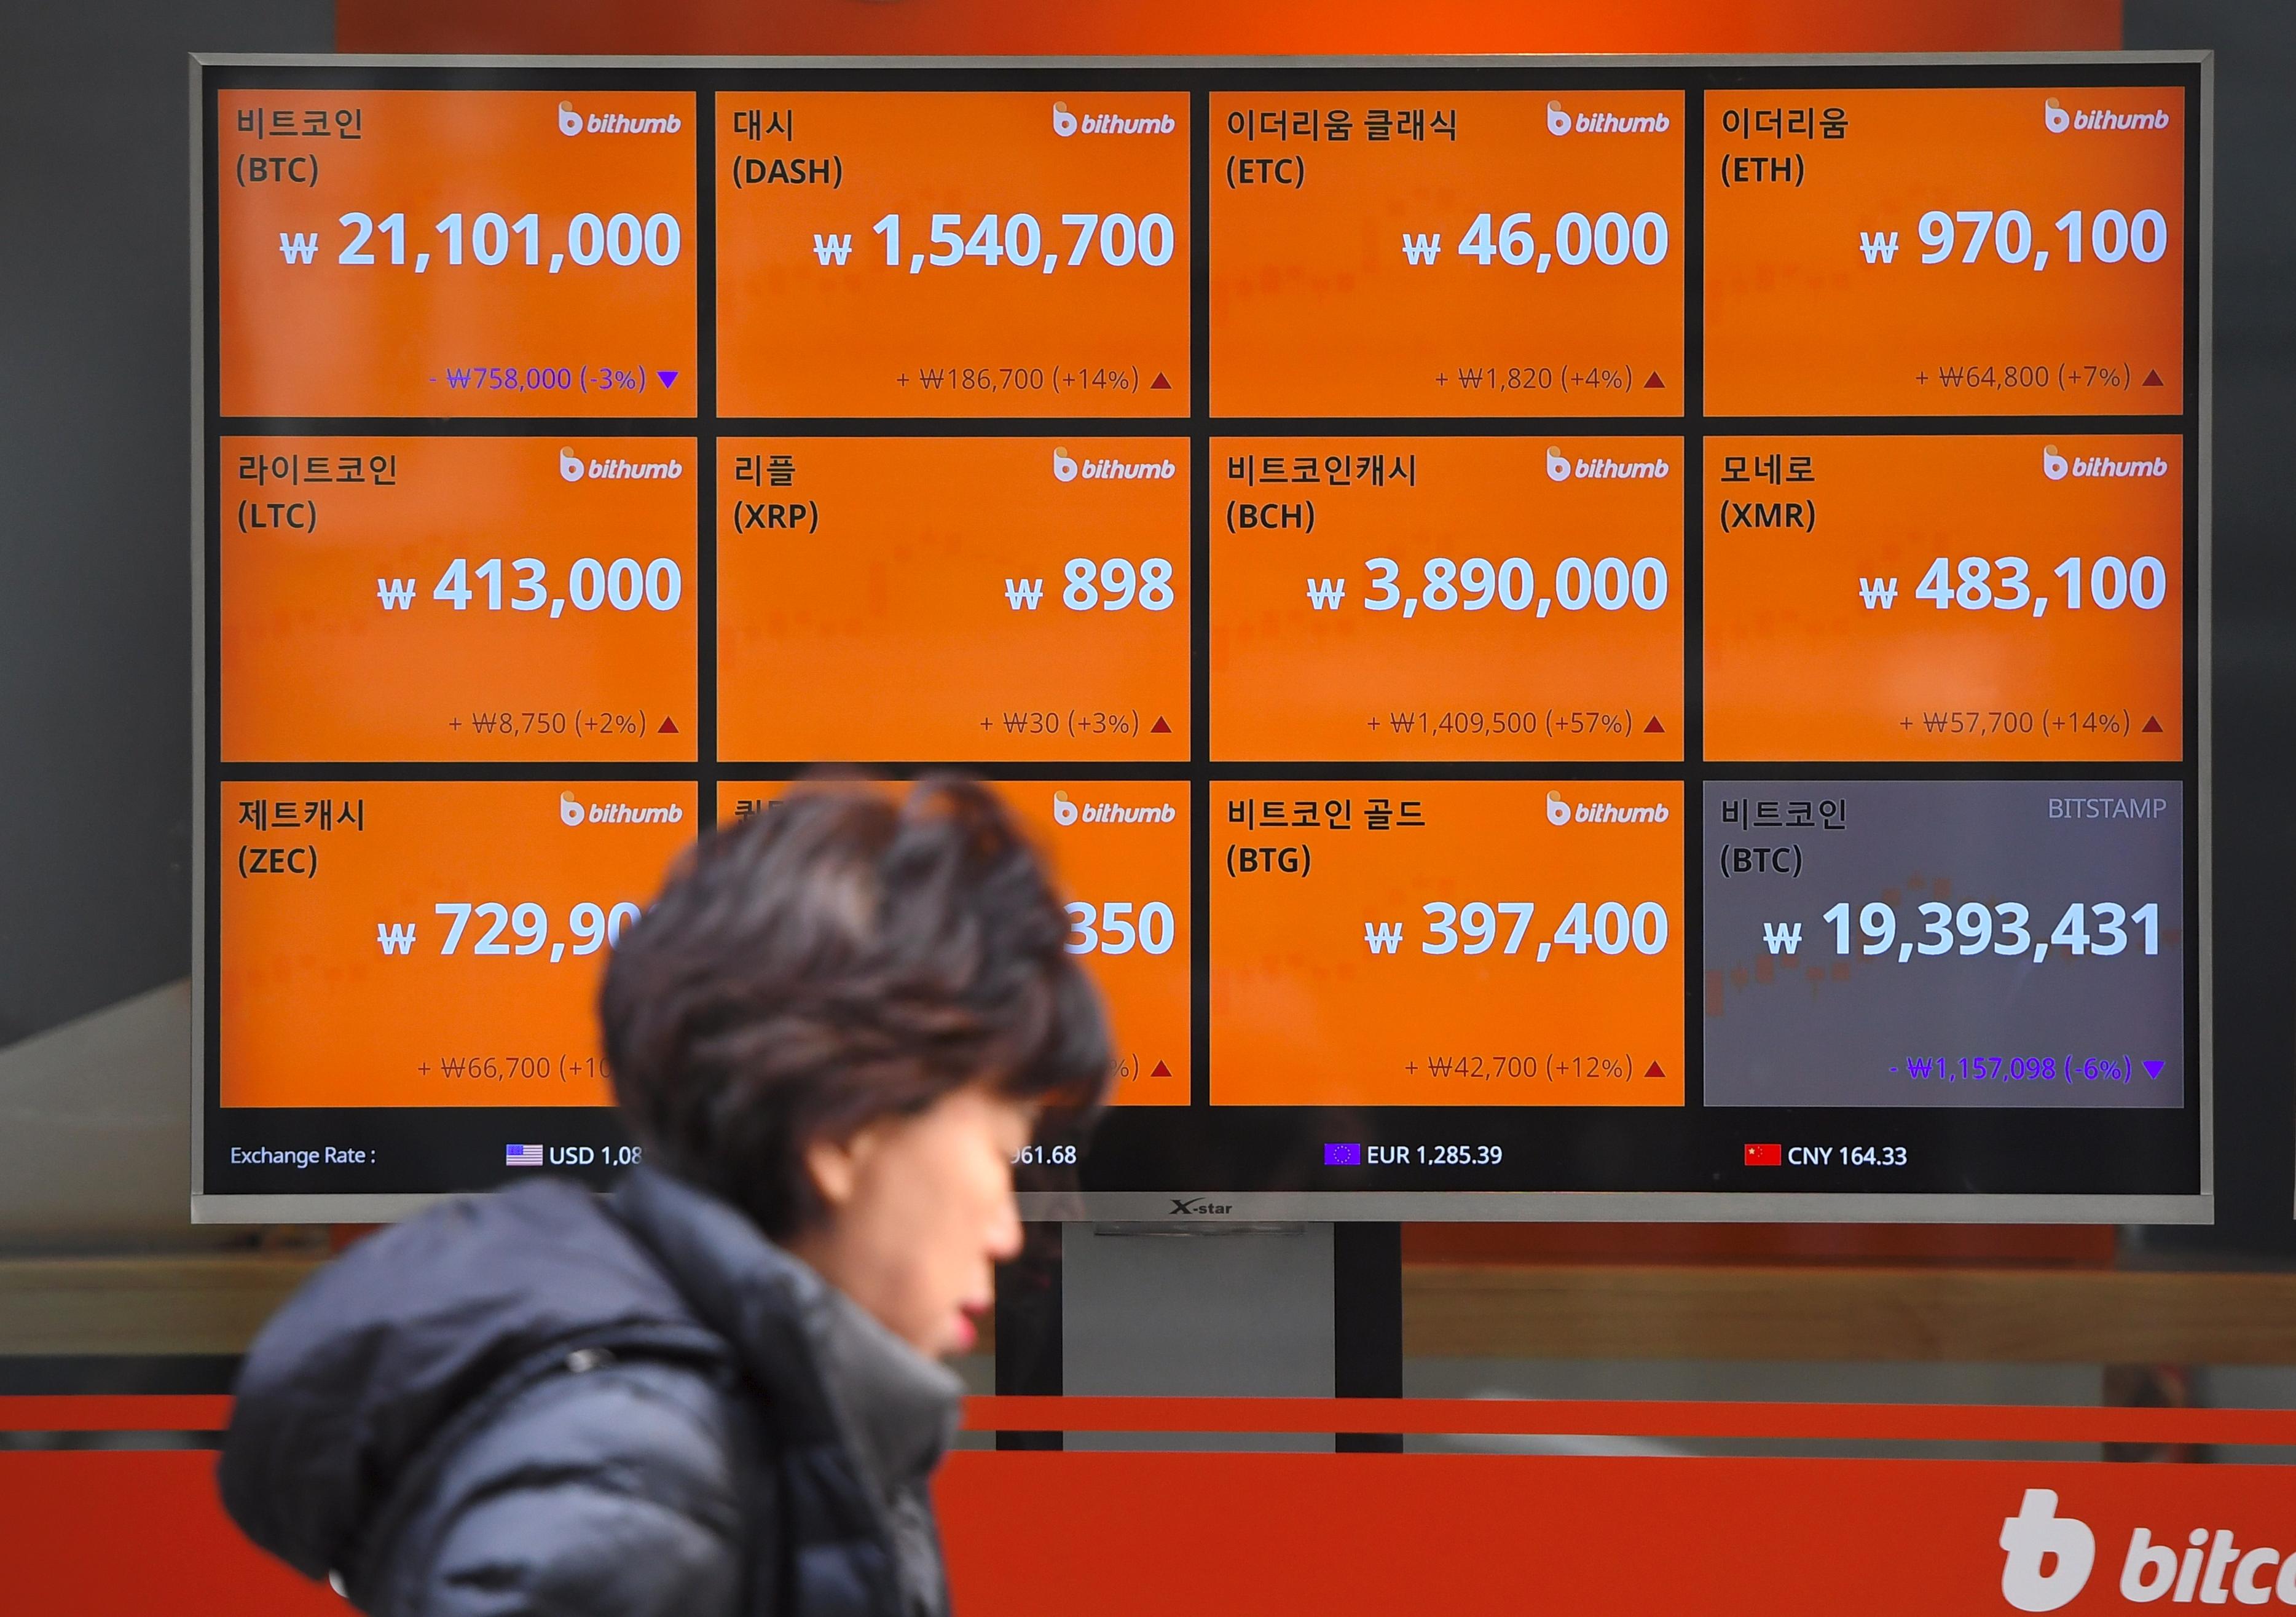 South Korea's Senior Bitcoin Regulator Found Dead at Home | Observer